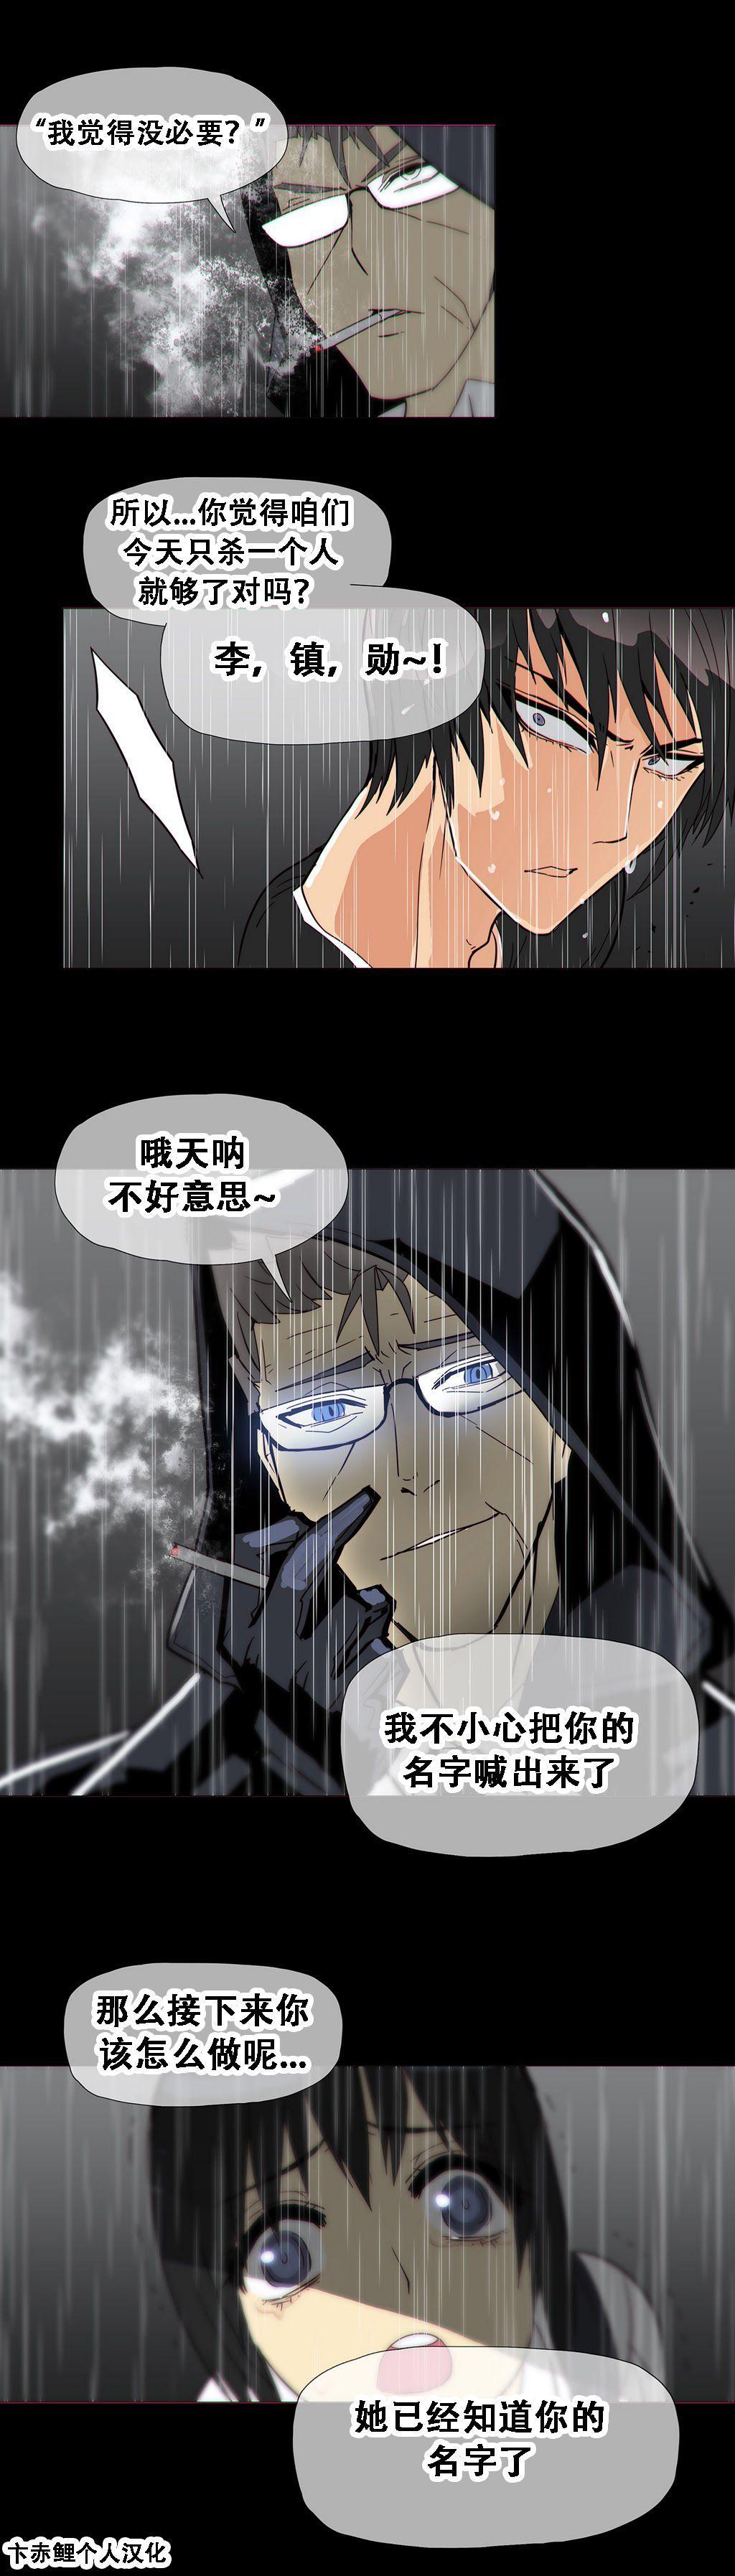 HouseHold Affairs 【卞赤鲤个人汉化】1~33话(持续更新中) 334